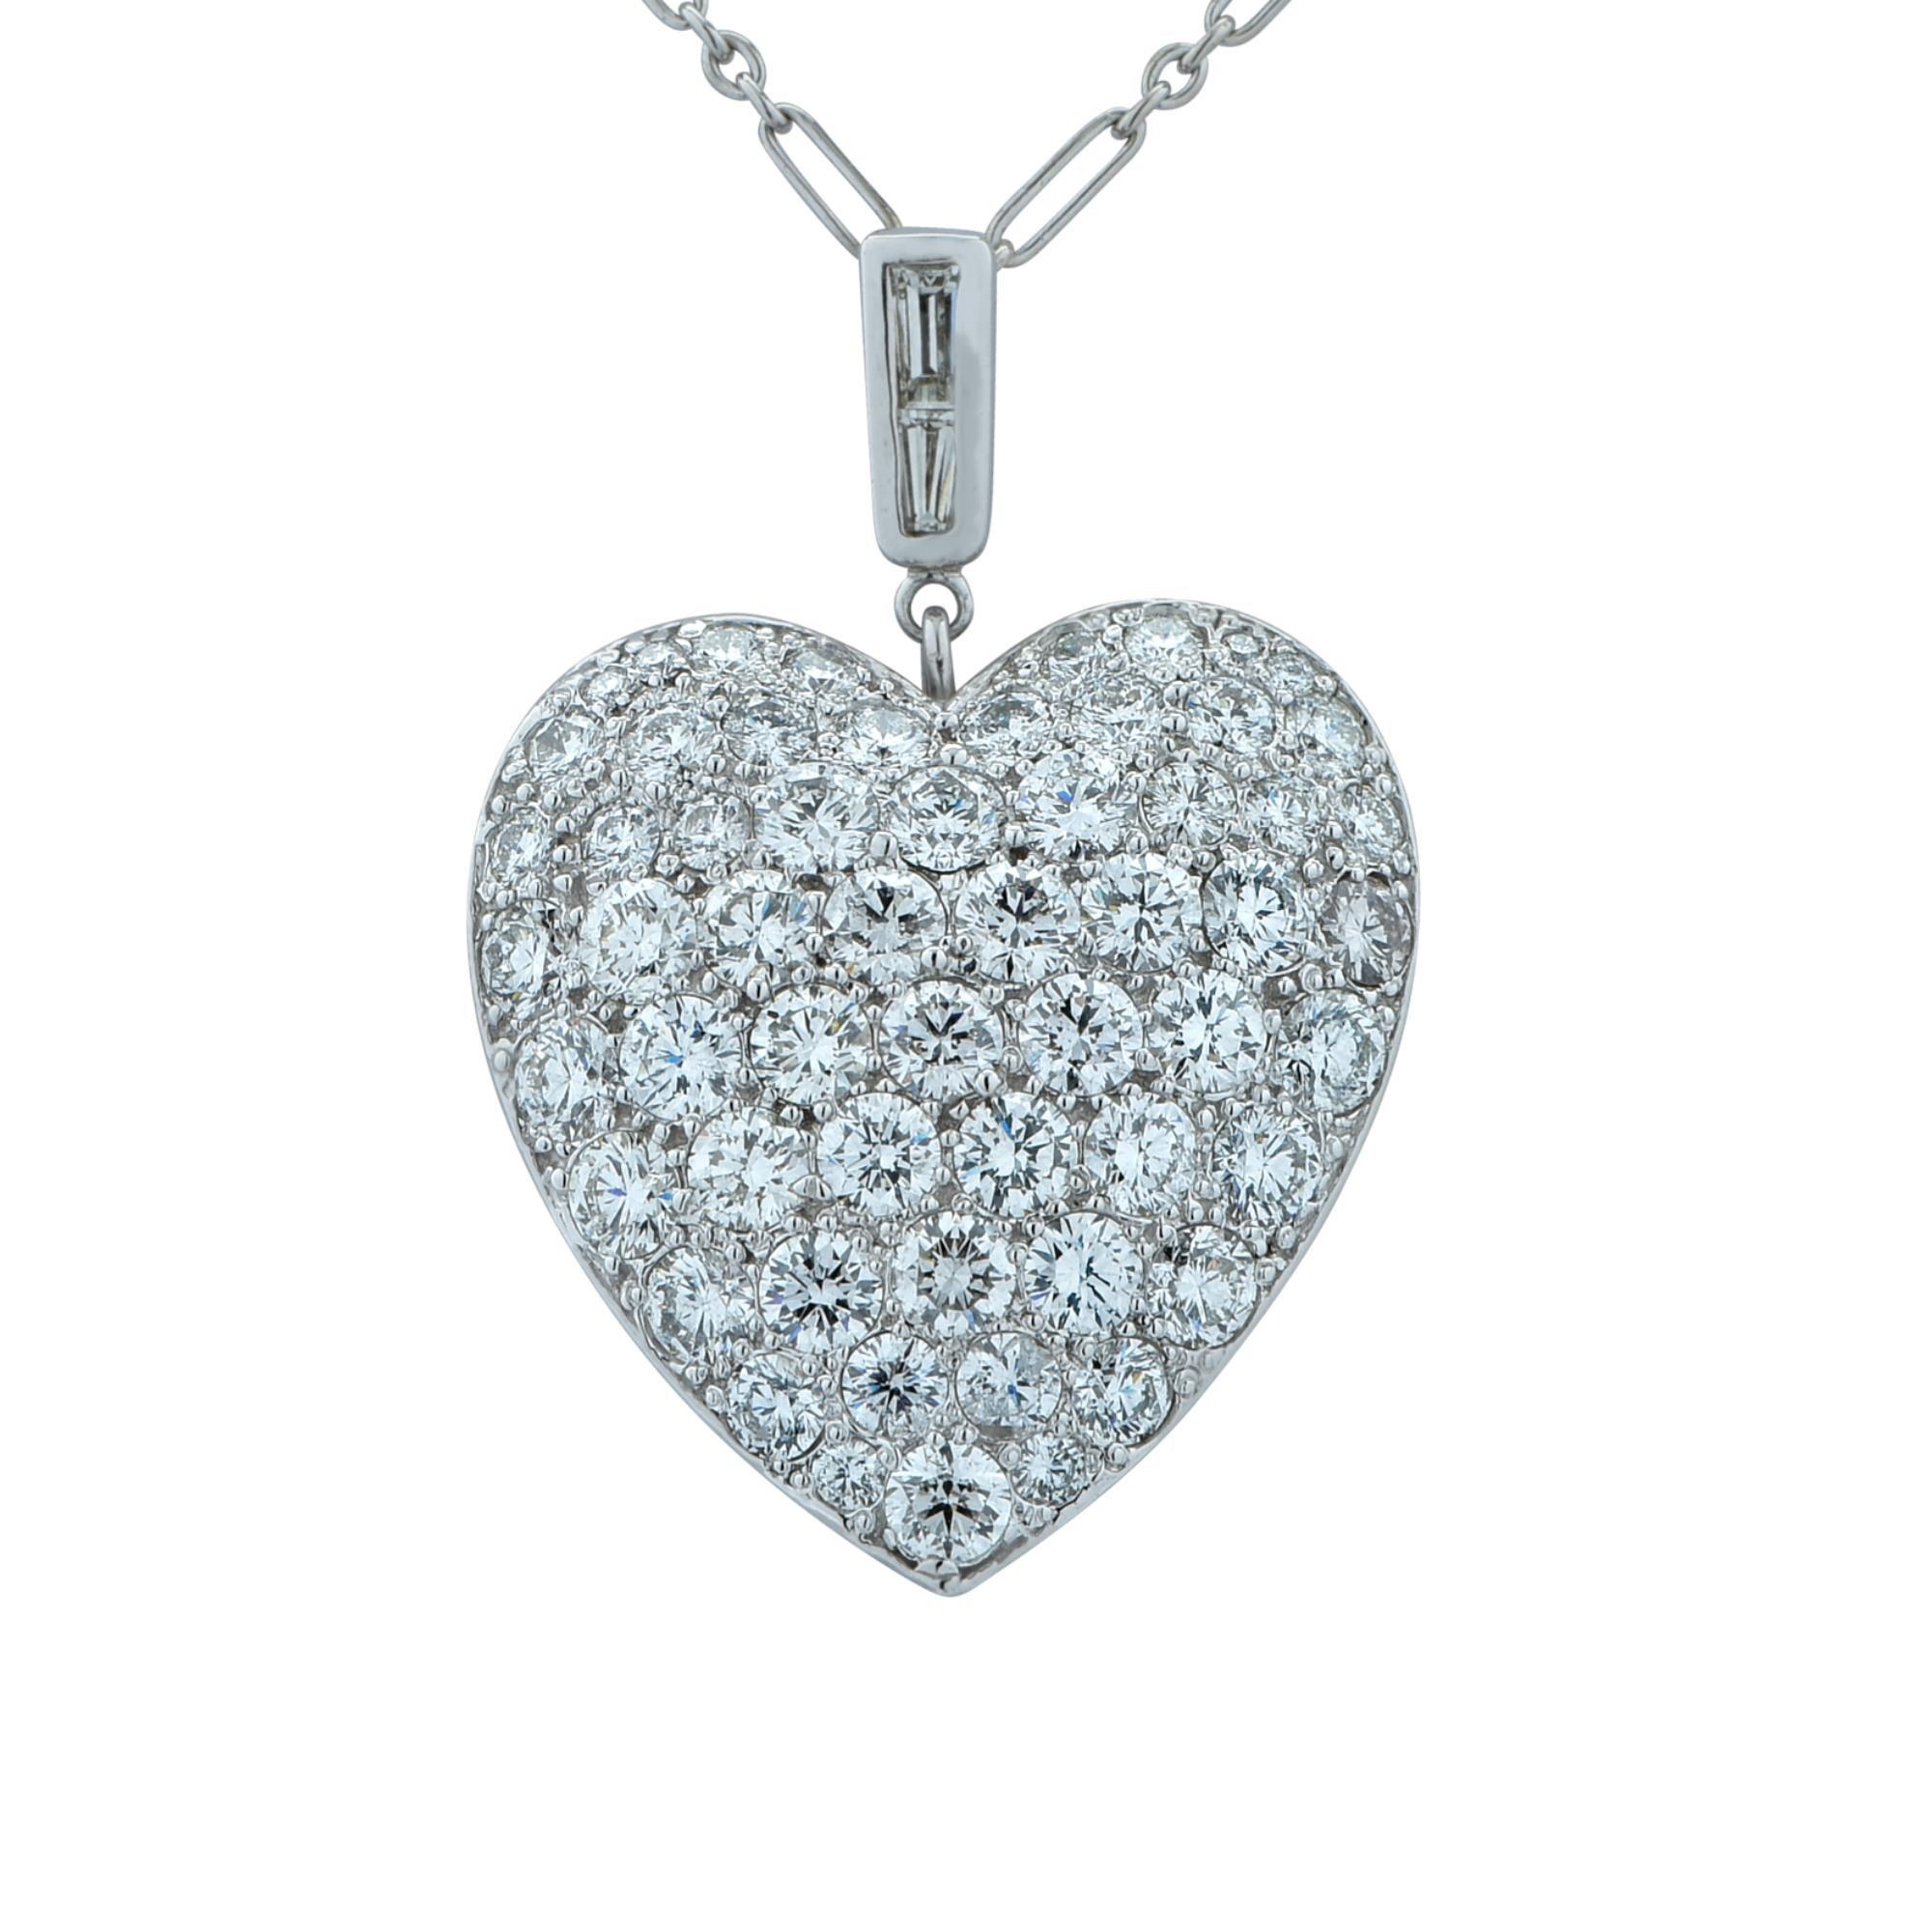 7 Carat Diamond Heart and Diamond Necklace